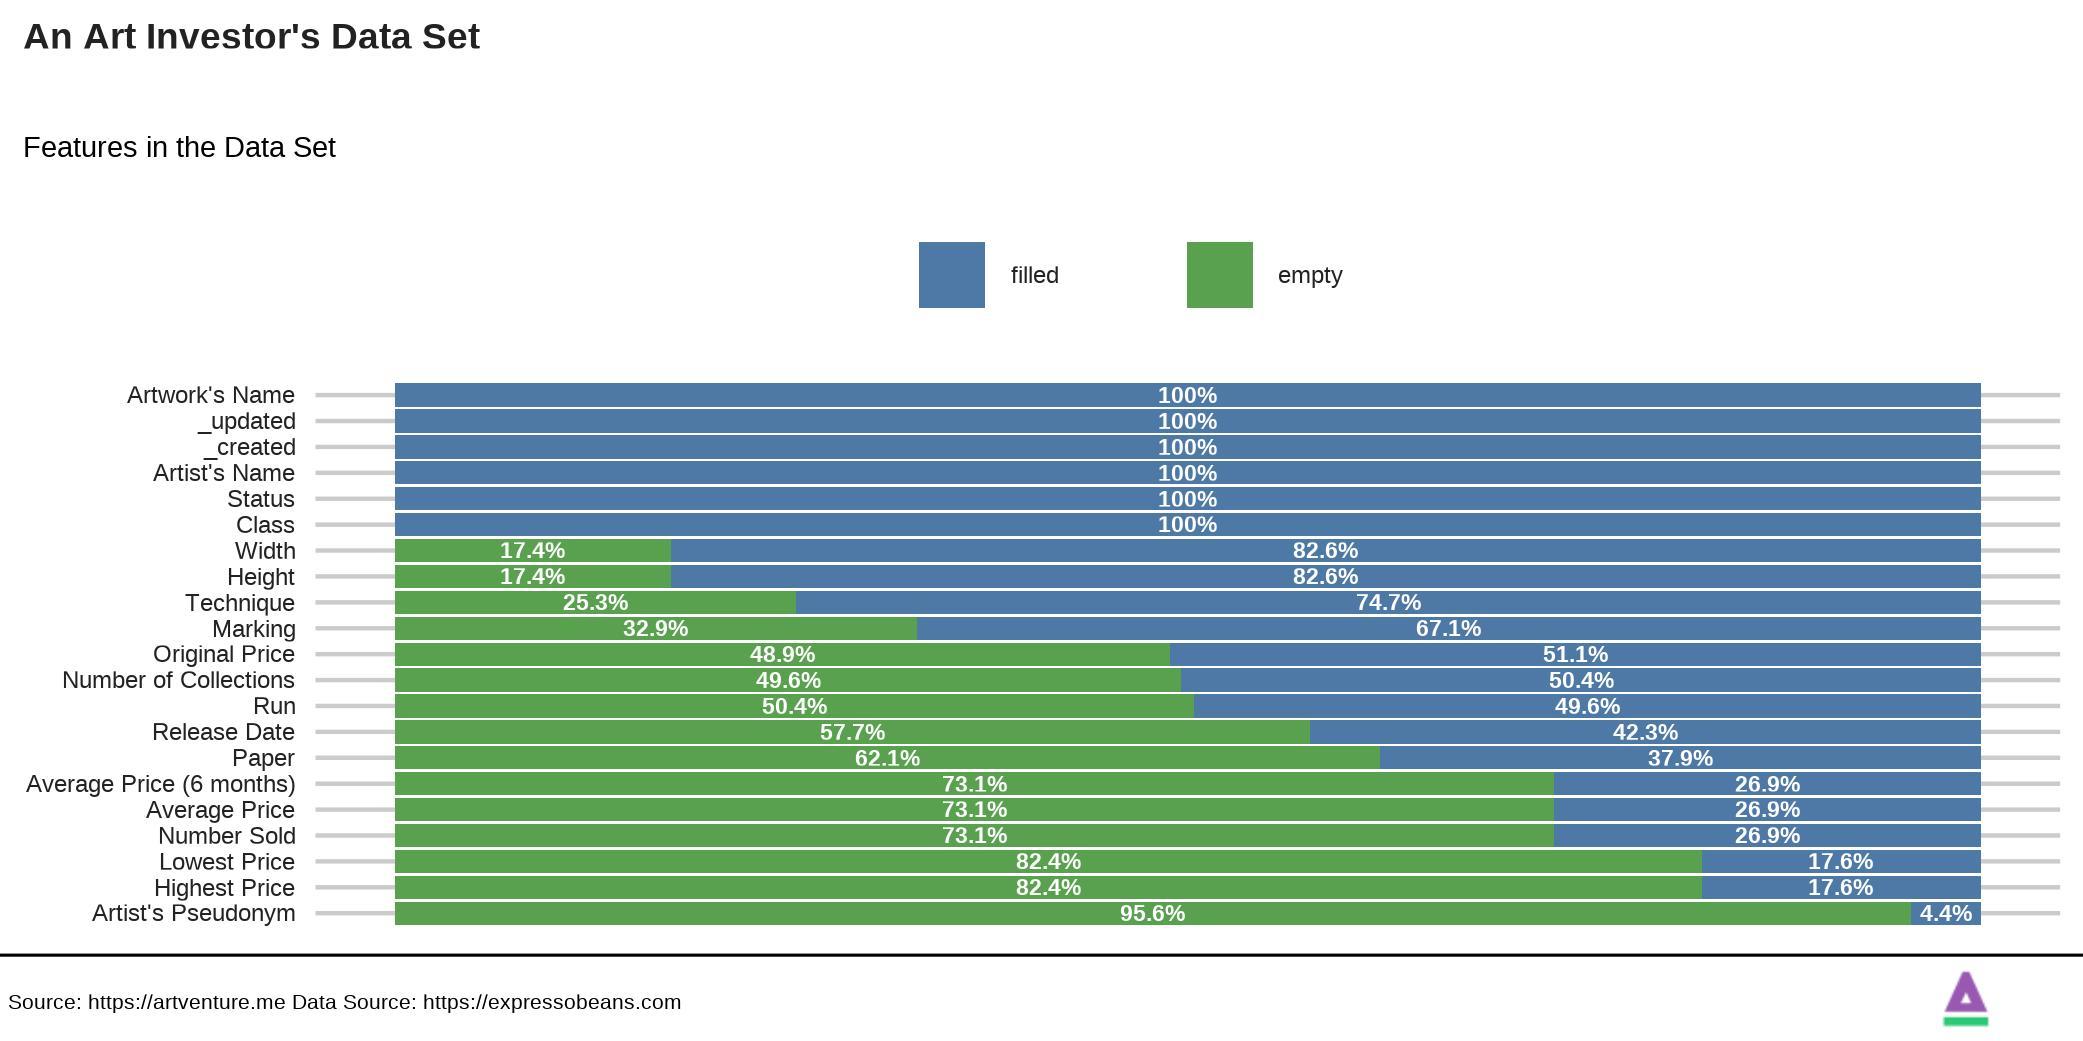 Artinvestor's Data Set Features